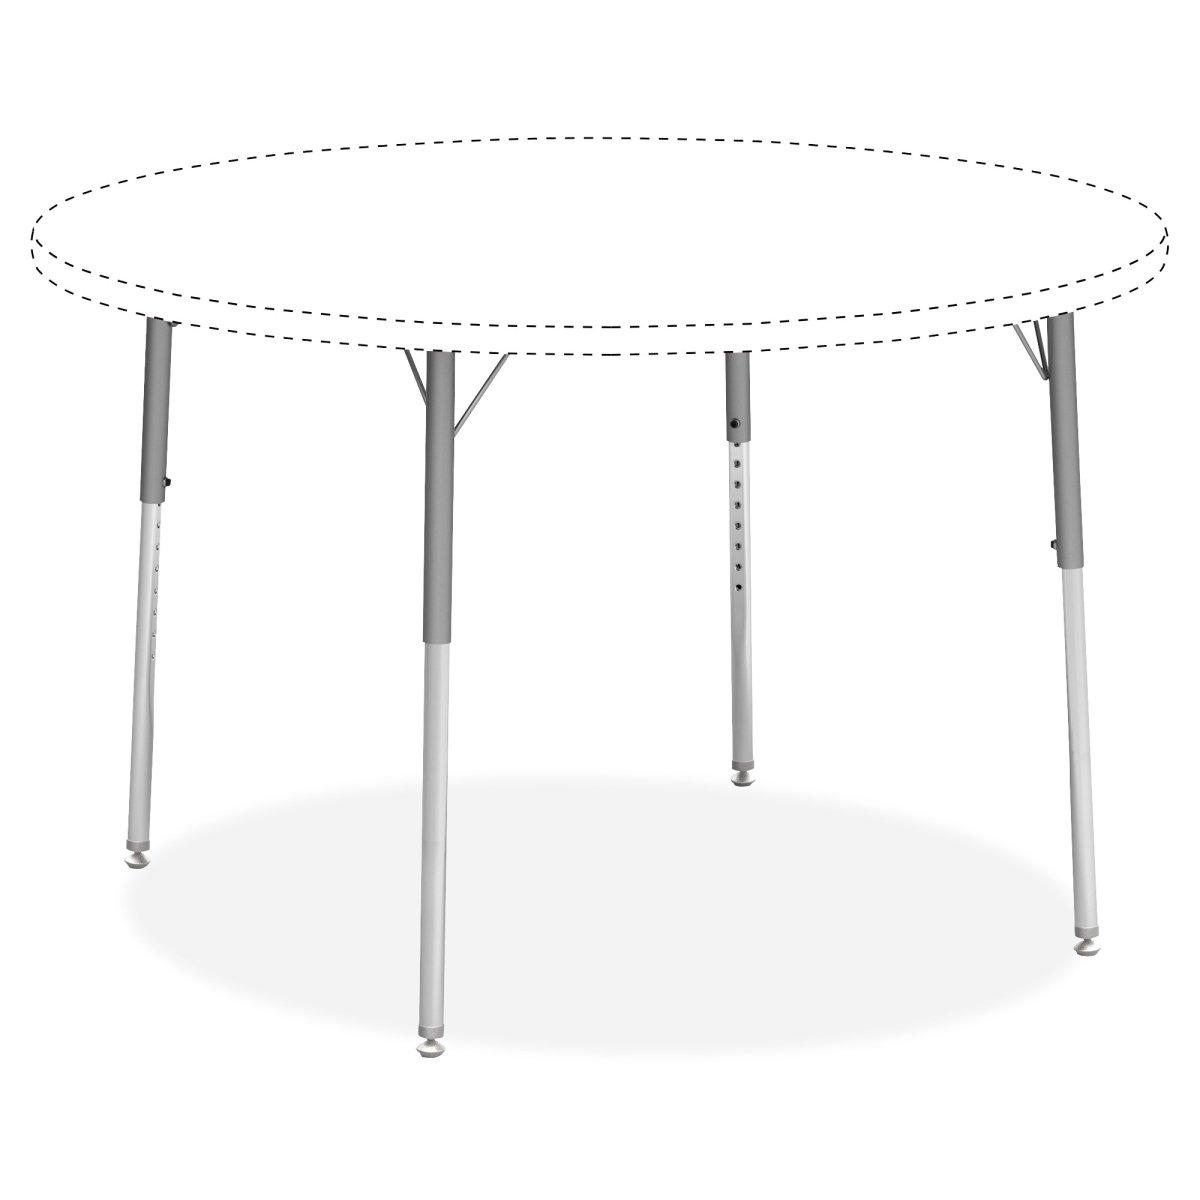 Lorell Classroom Activity Table Standard Height Adjustable Leg Kit - Chrome, Silver Mist